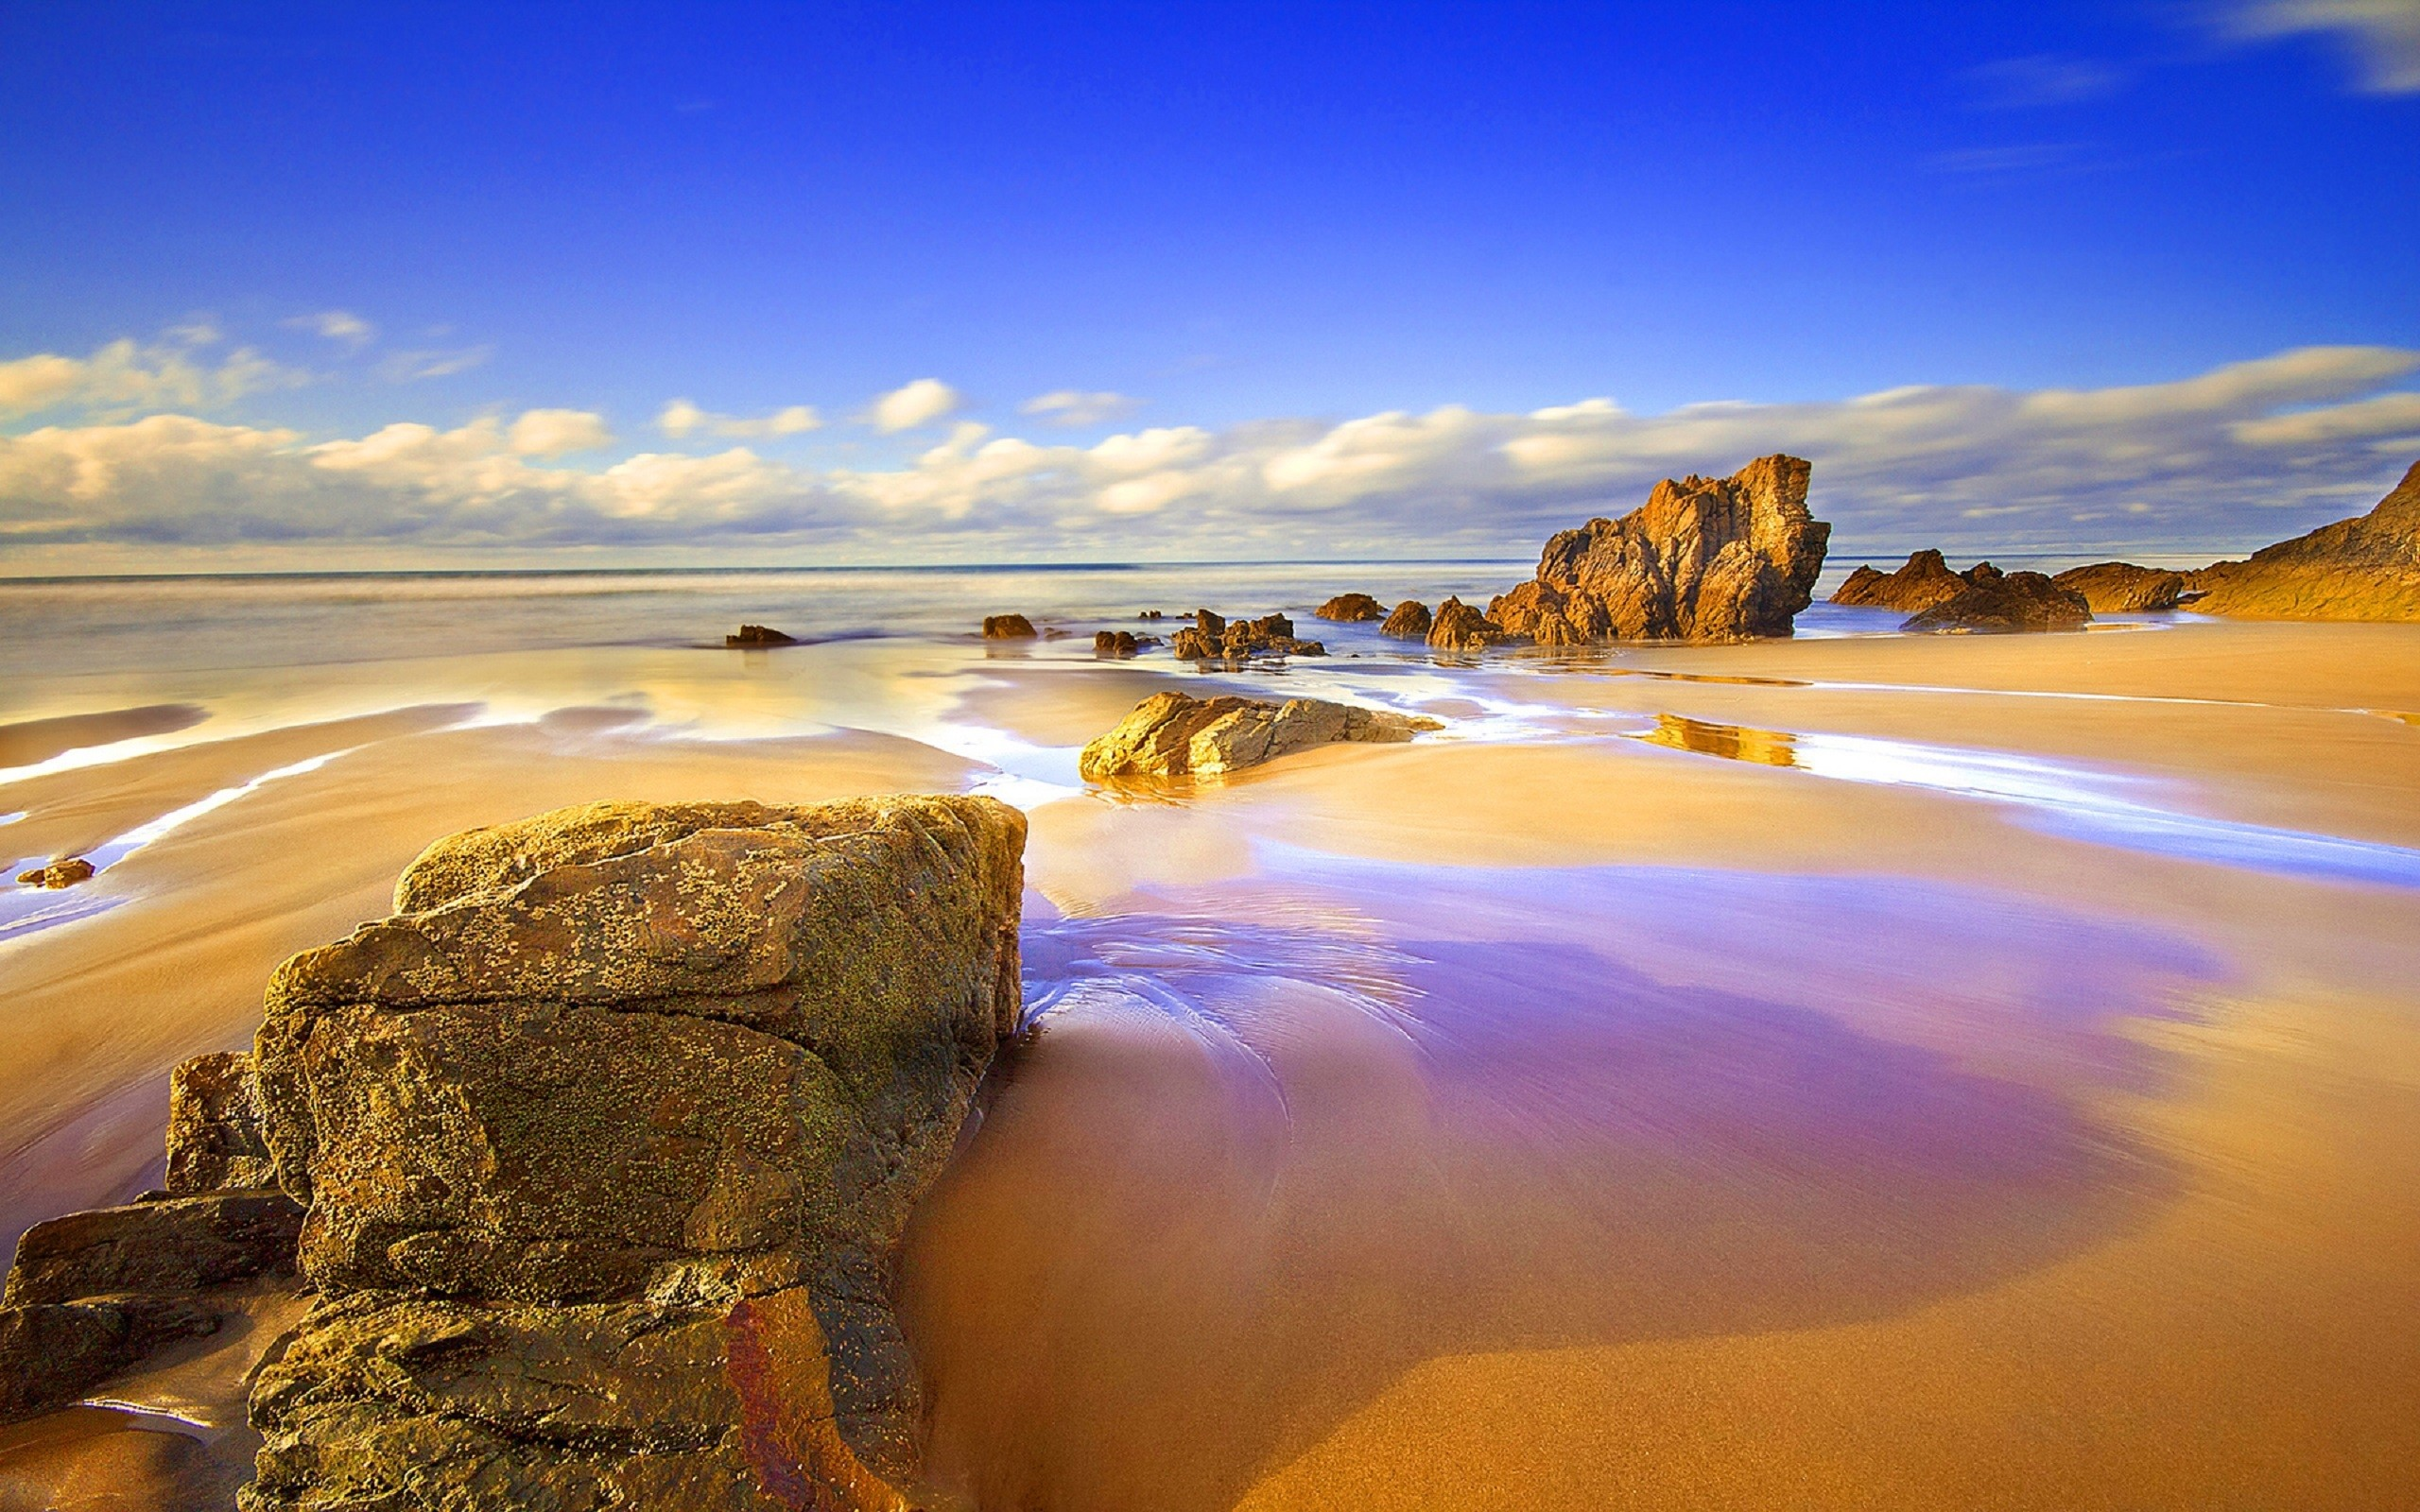 Beach Wallpaper: Sand Beach Wallpaper ·① WallpaperTag